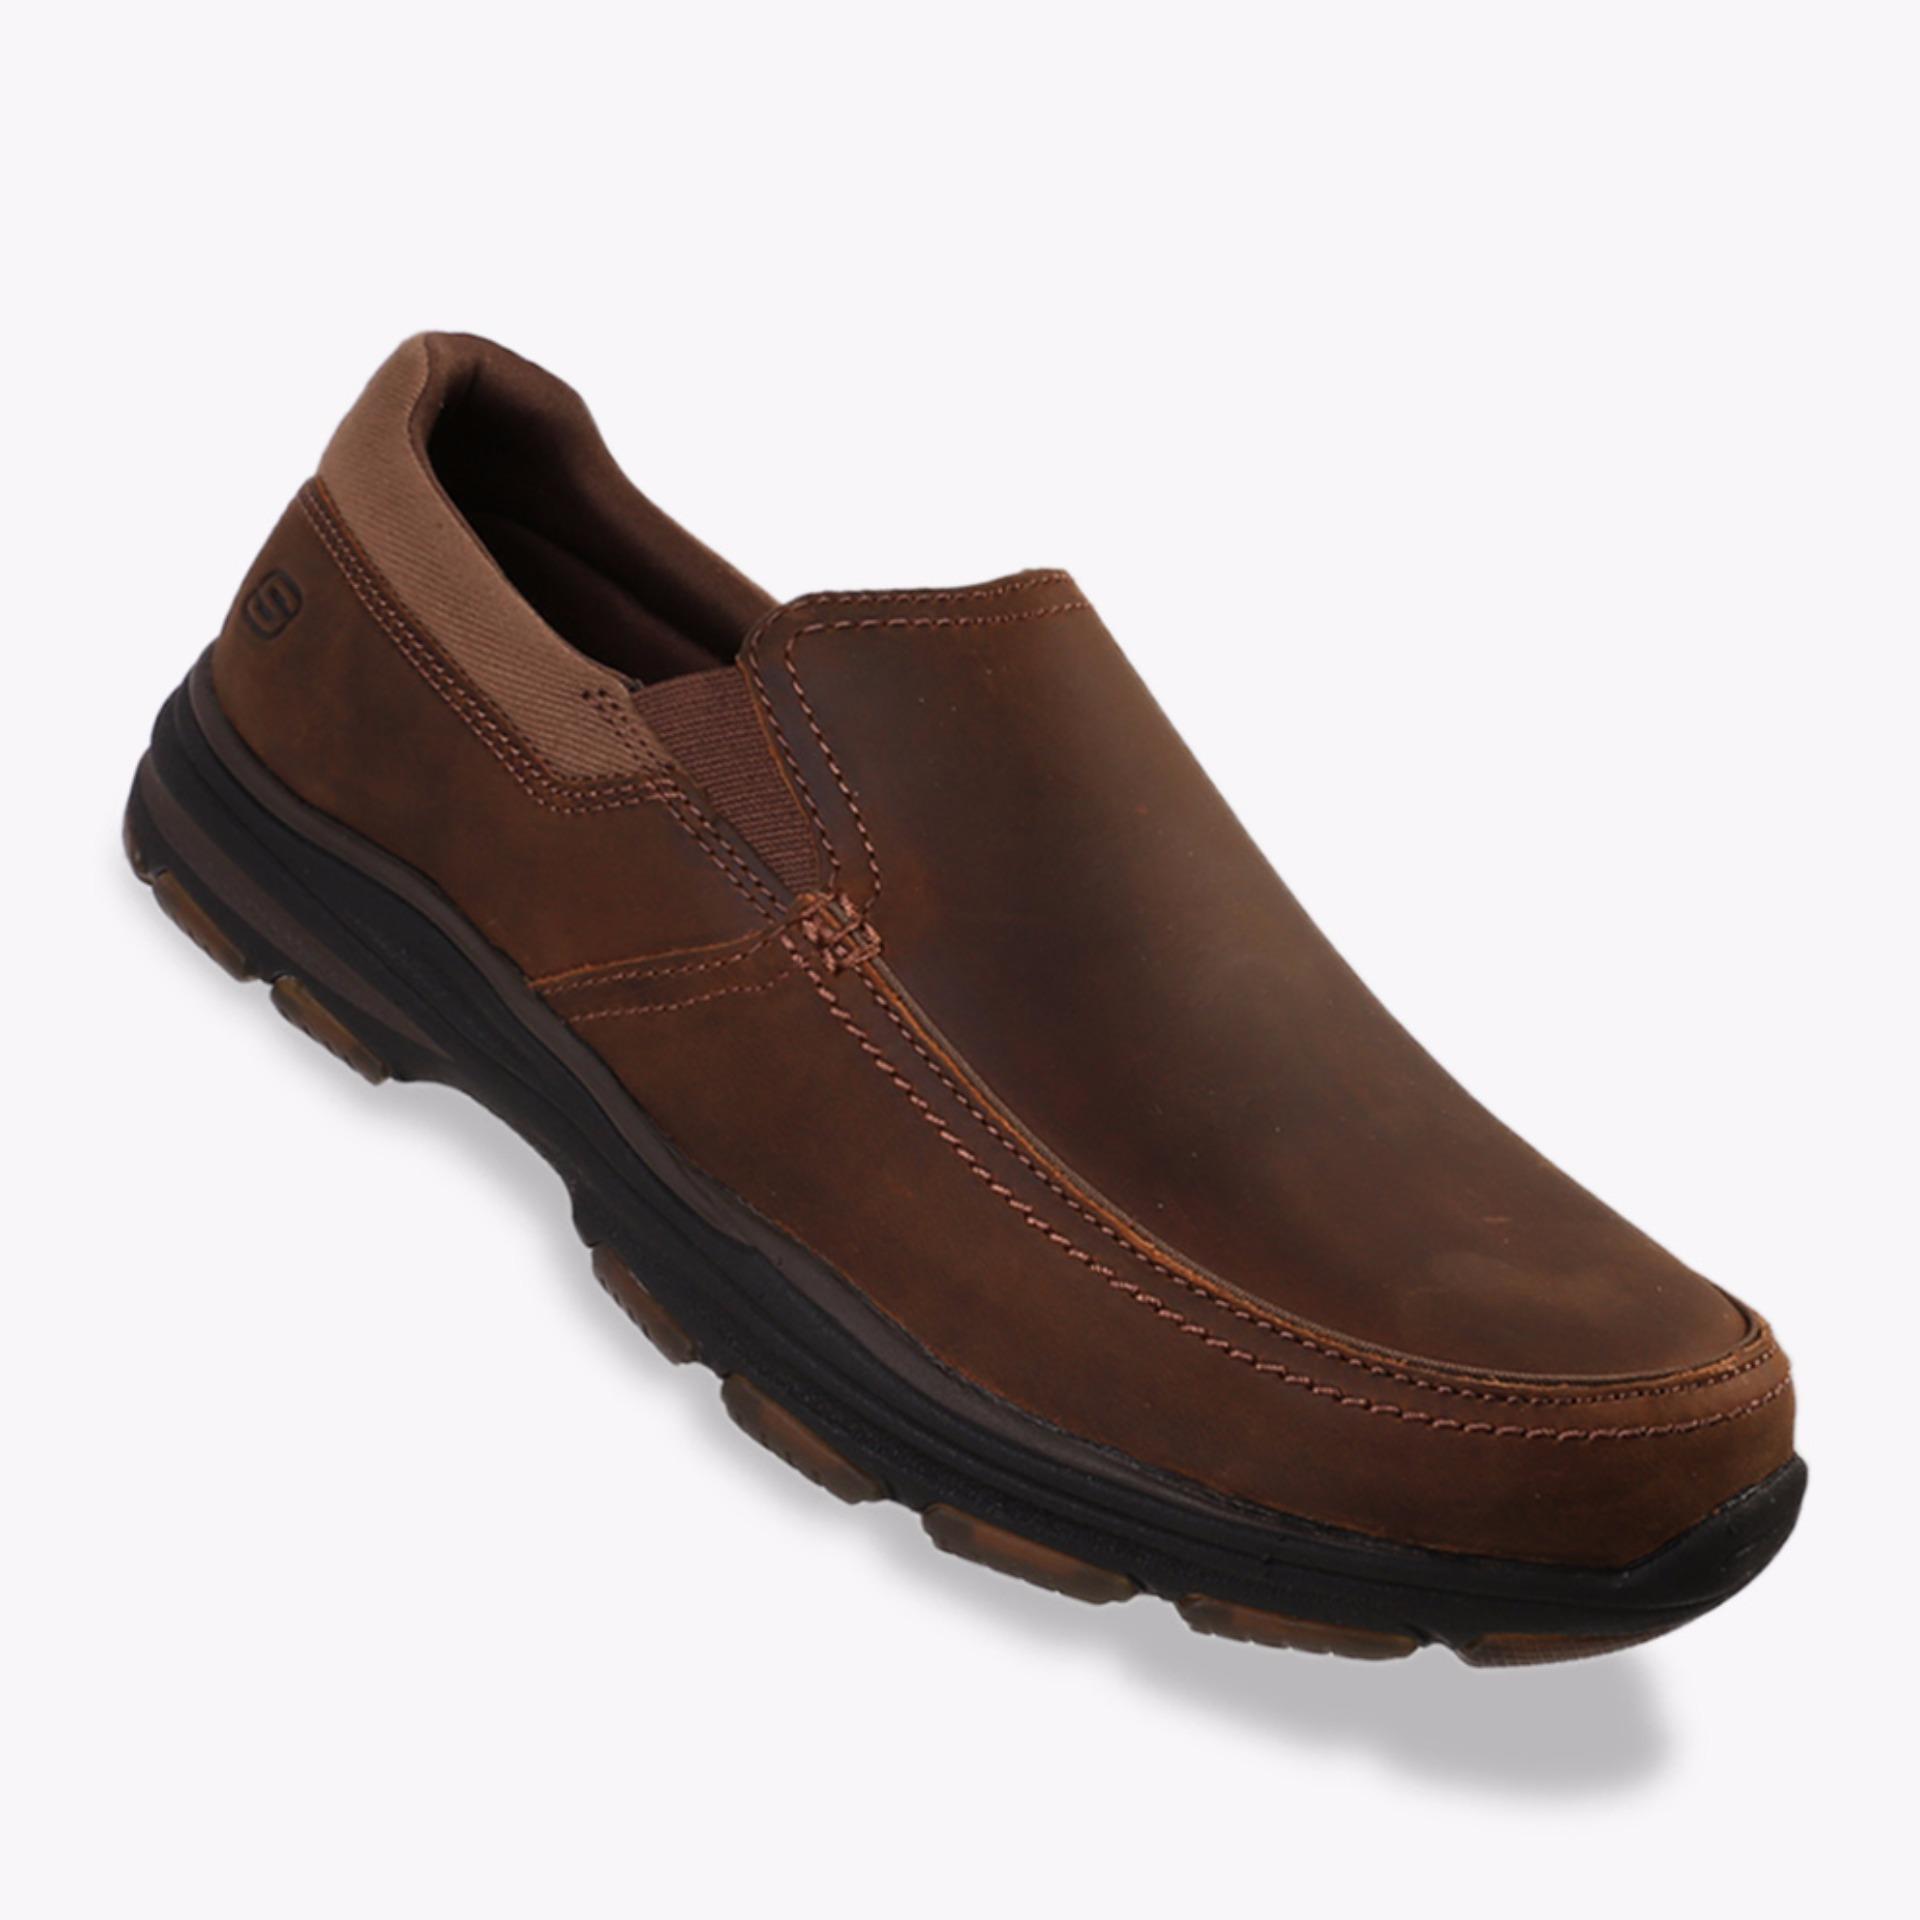 Skechers Garton Venco Men S Casual Shoes Cokelat Indonesia